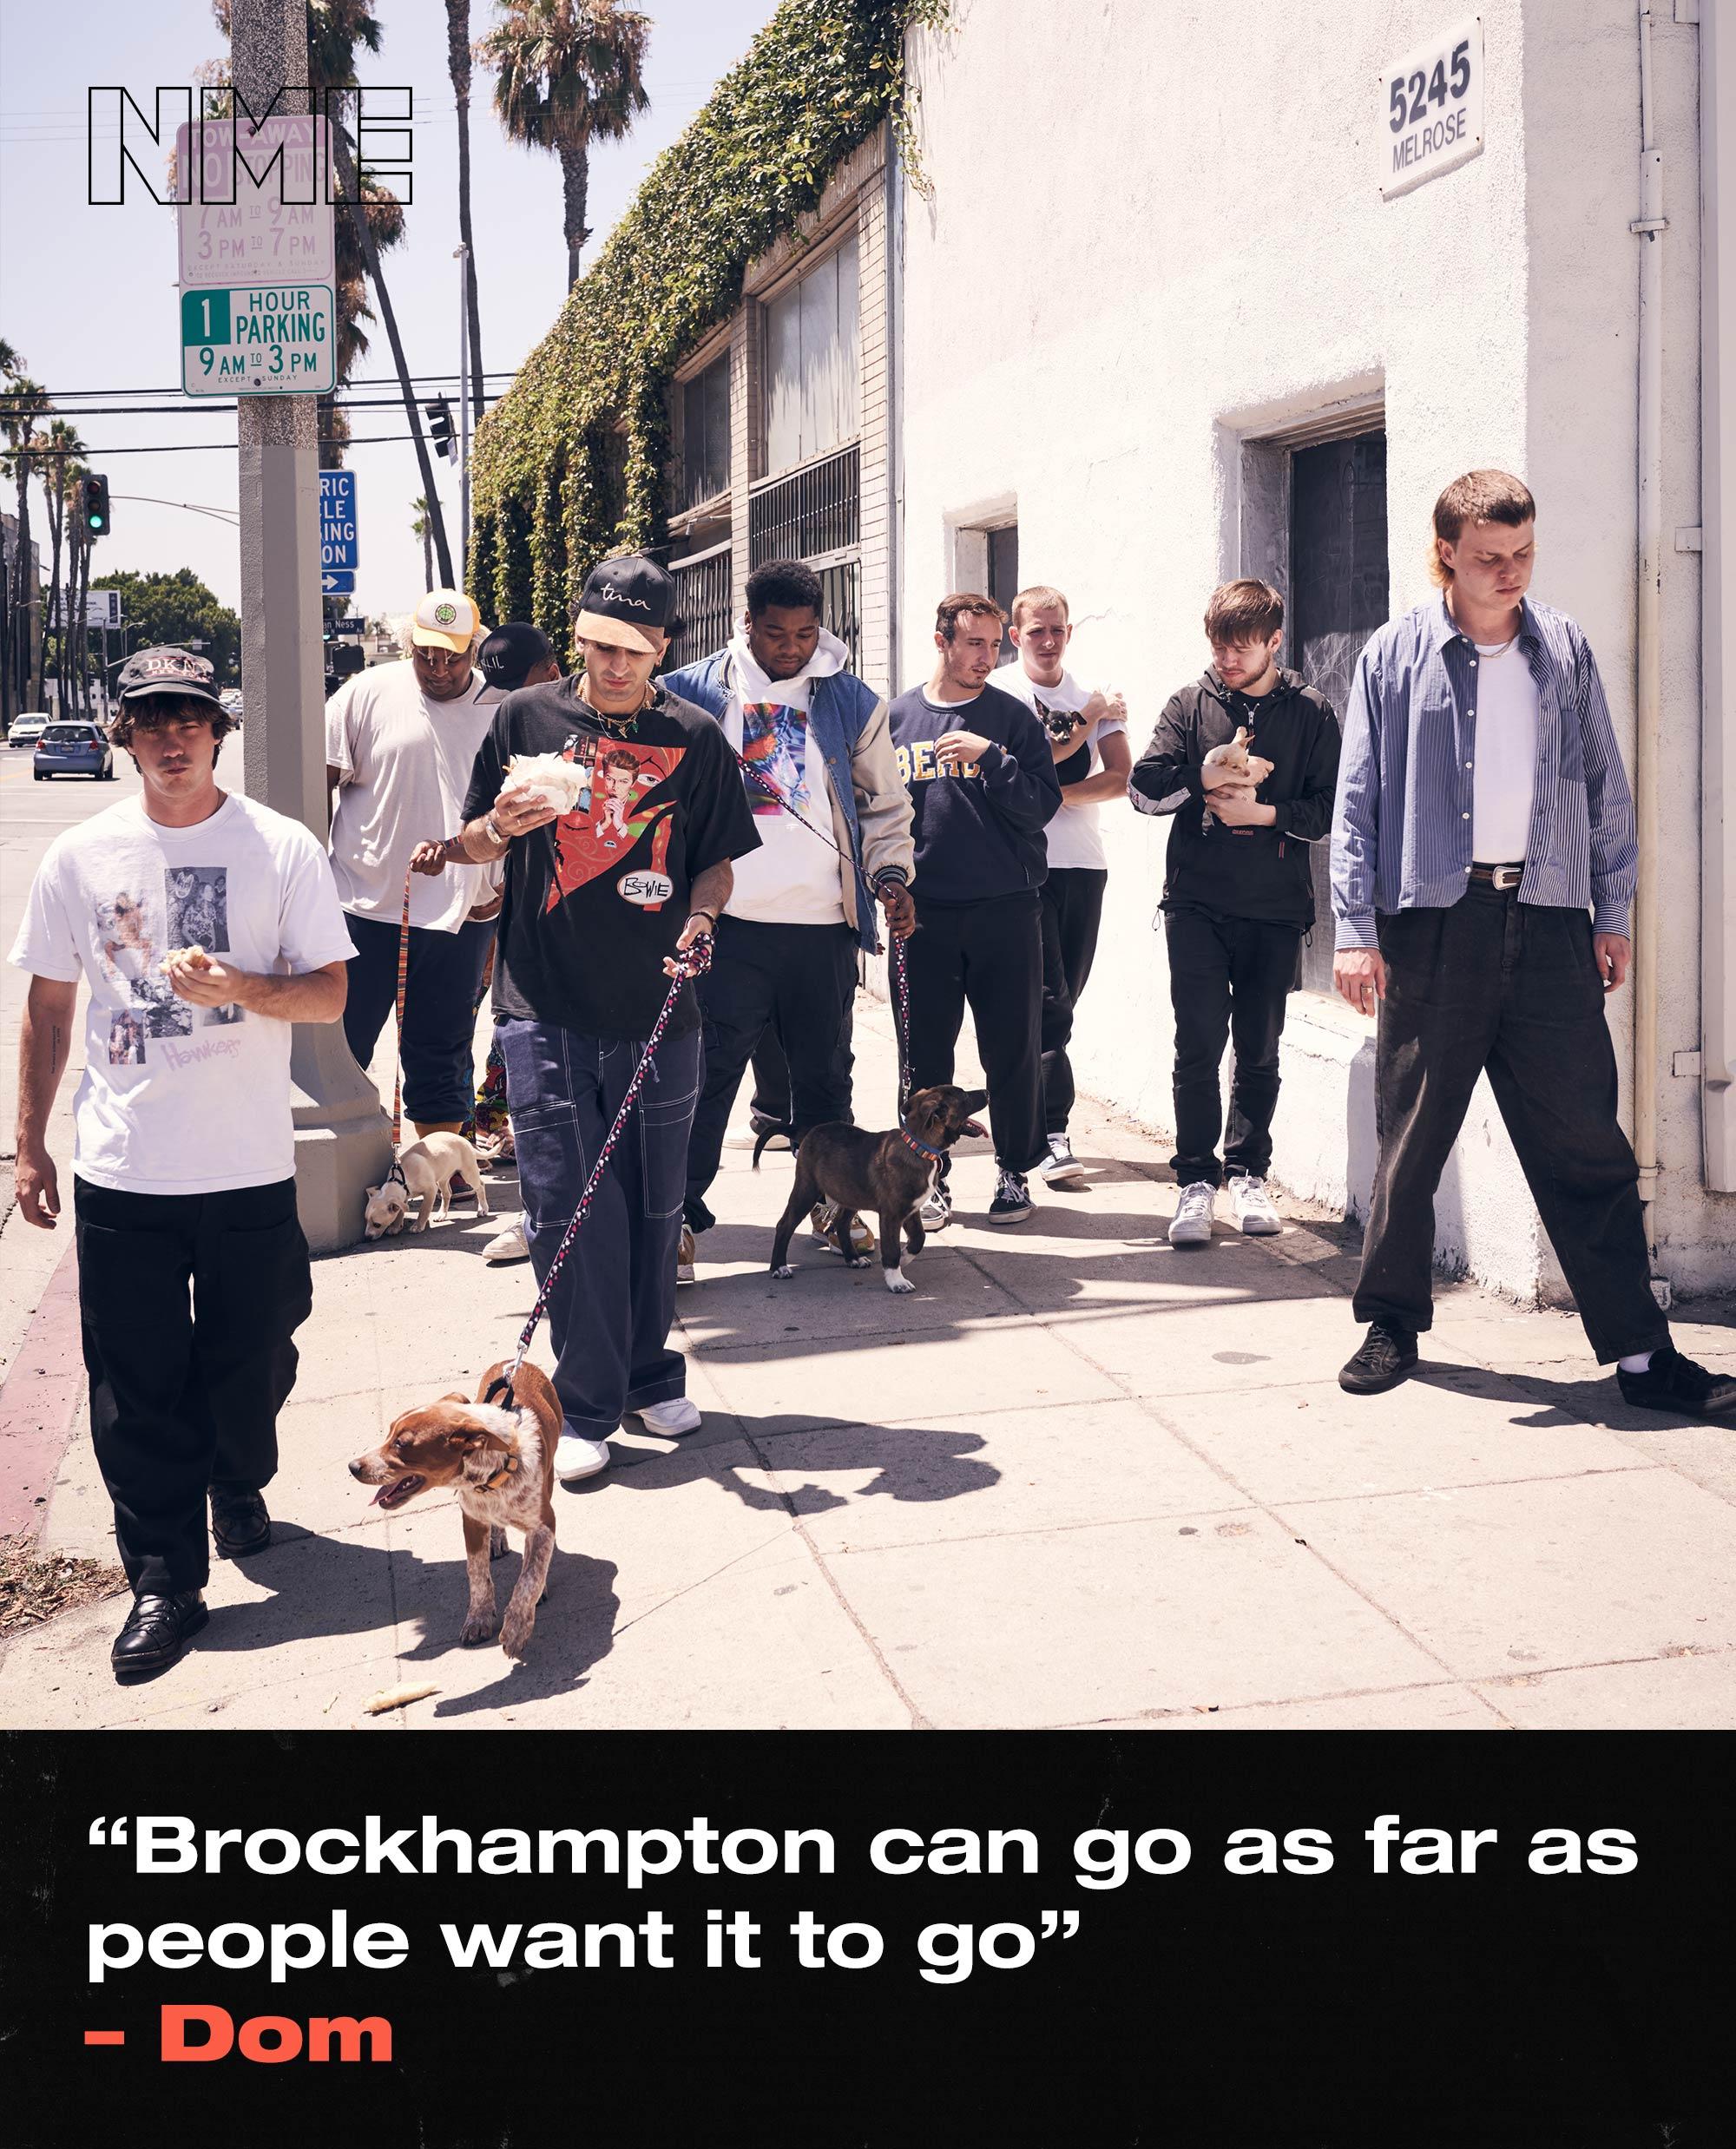 brockhampton